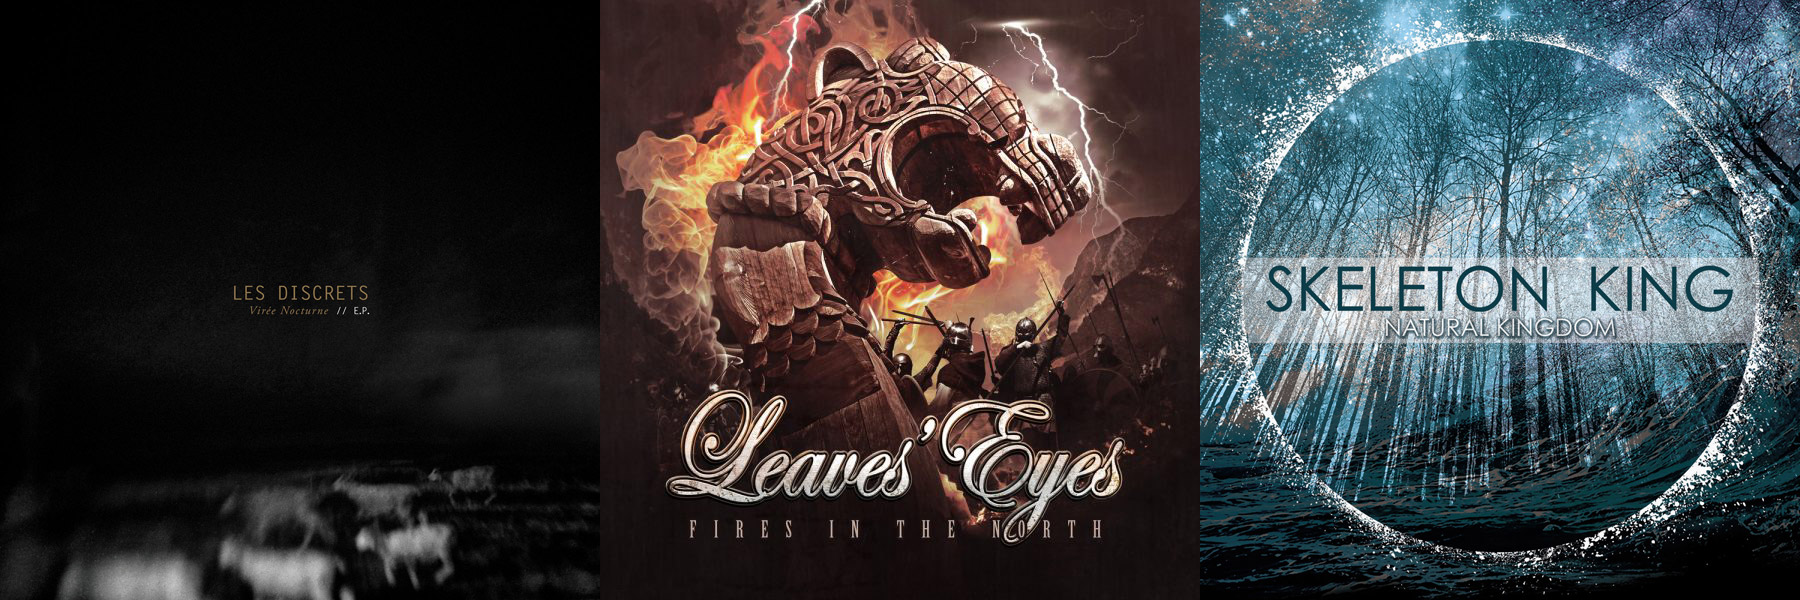 Les Discrets / Leaves' Eyes / Skeleton King